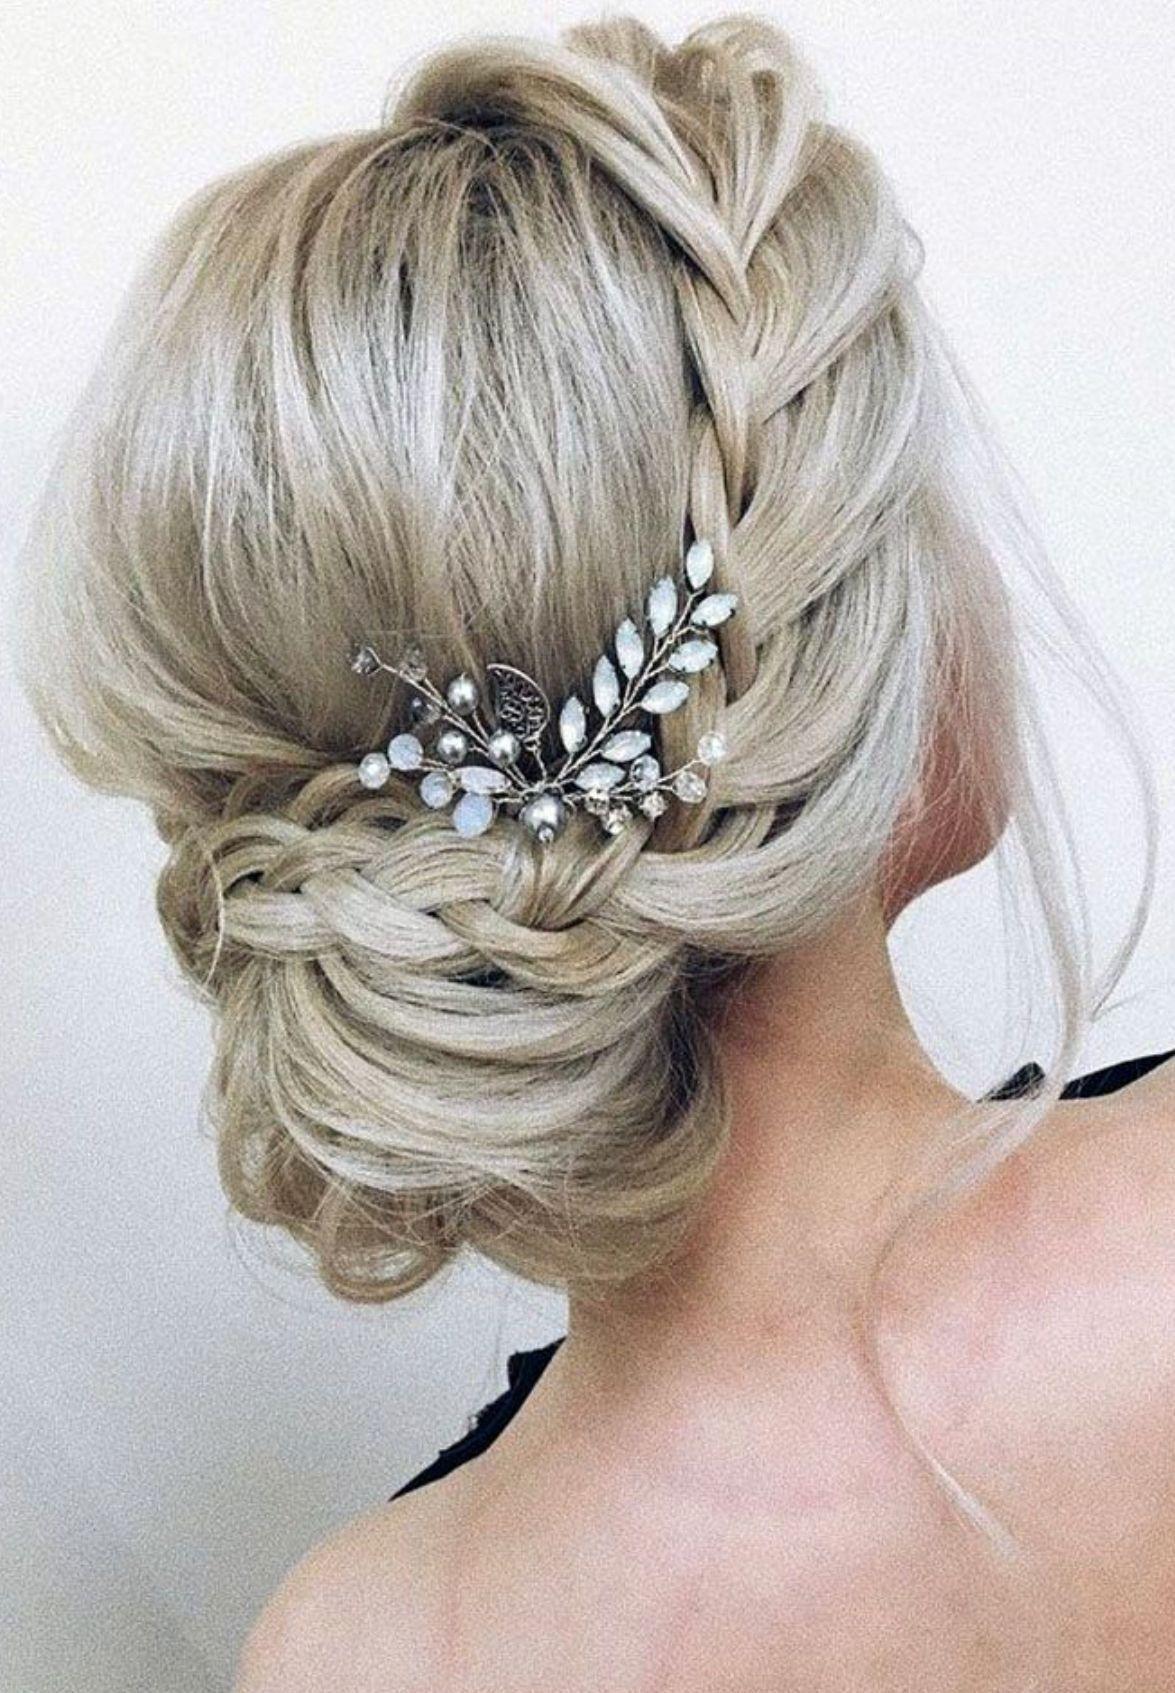 Wedding hair style idea beautiful ucchignon bunud with a